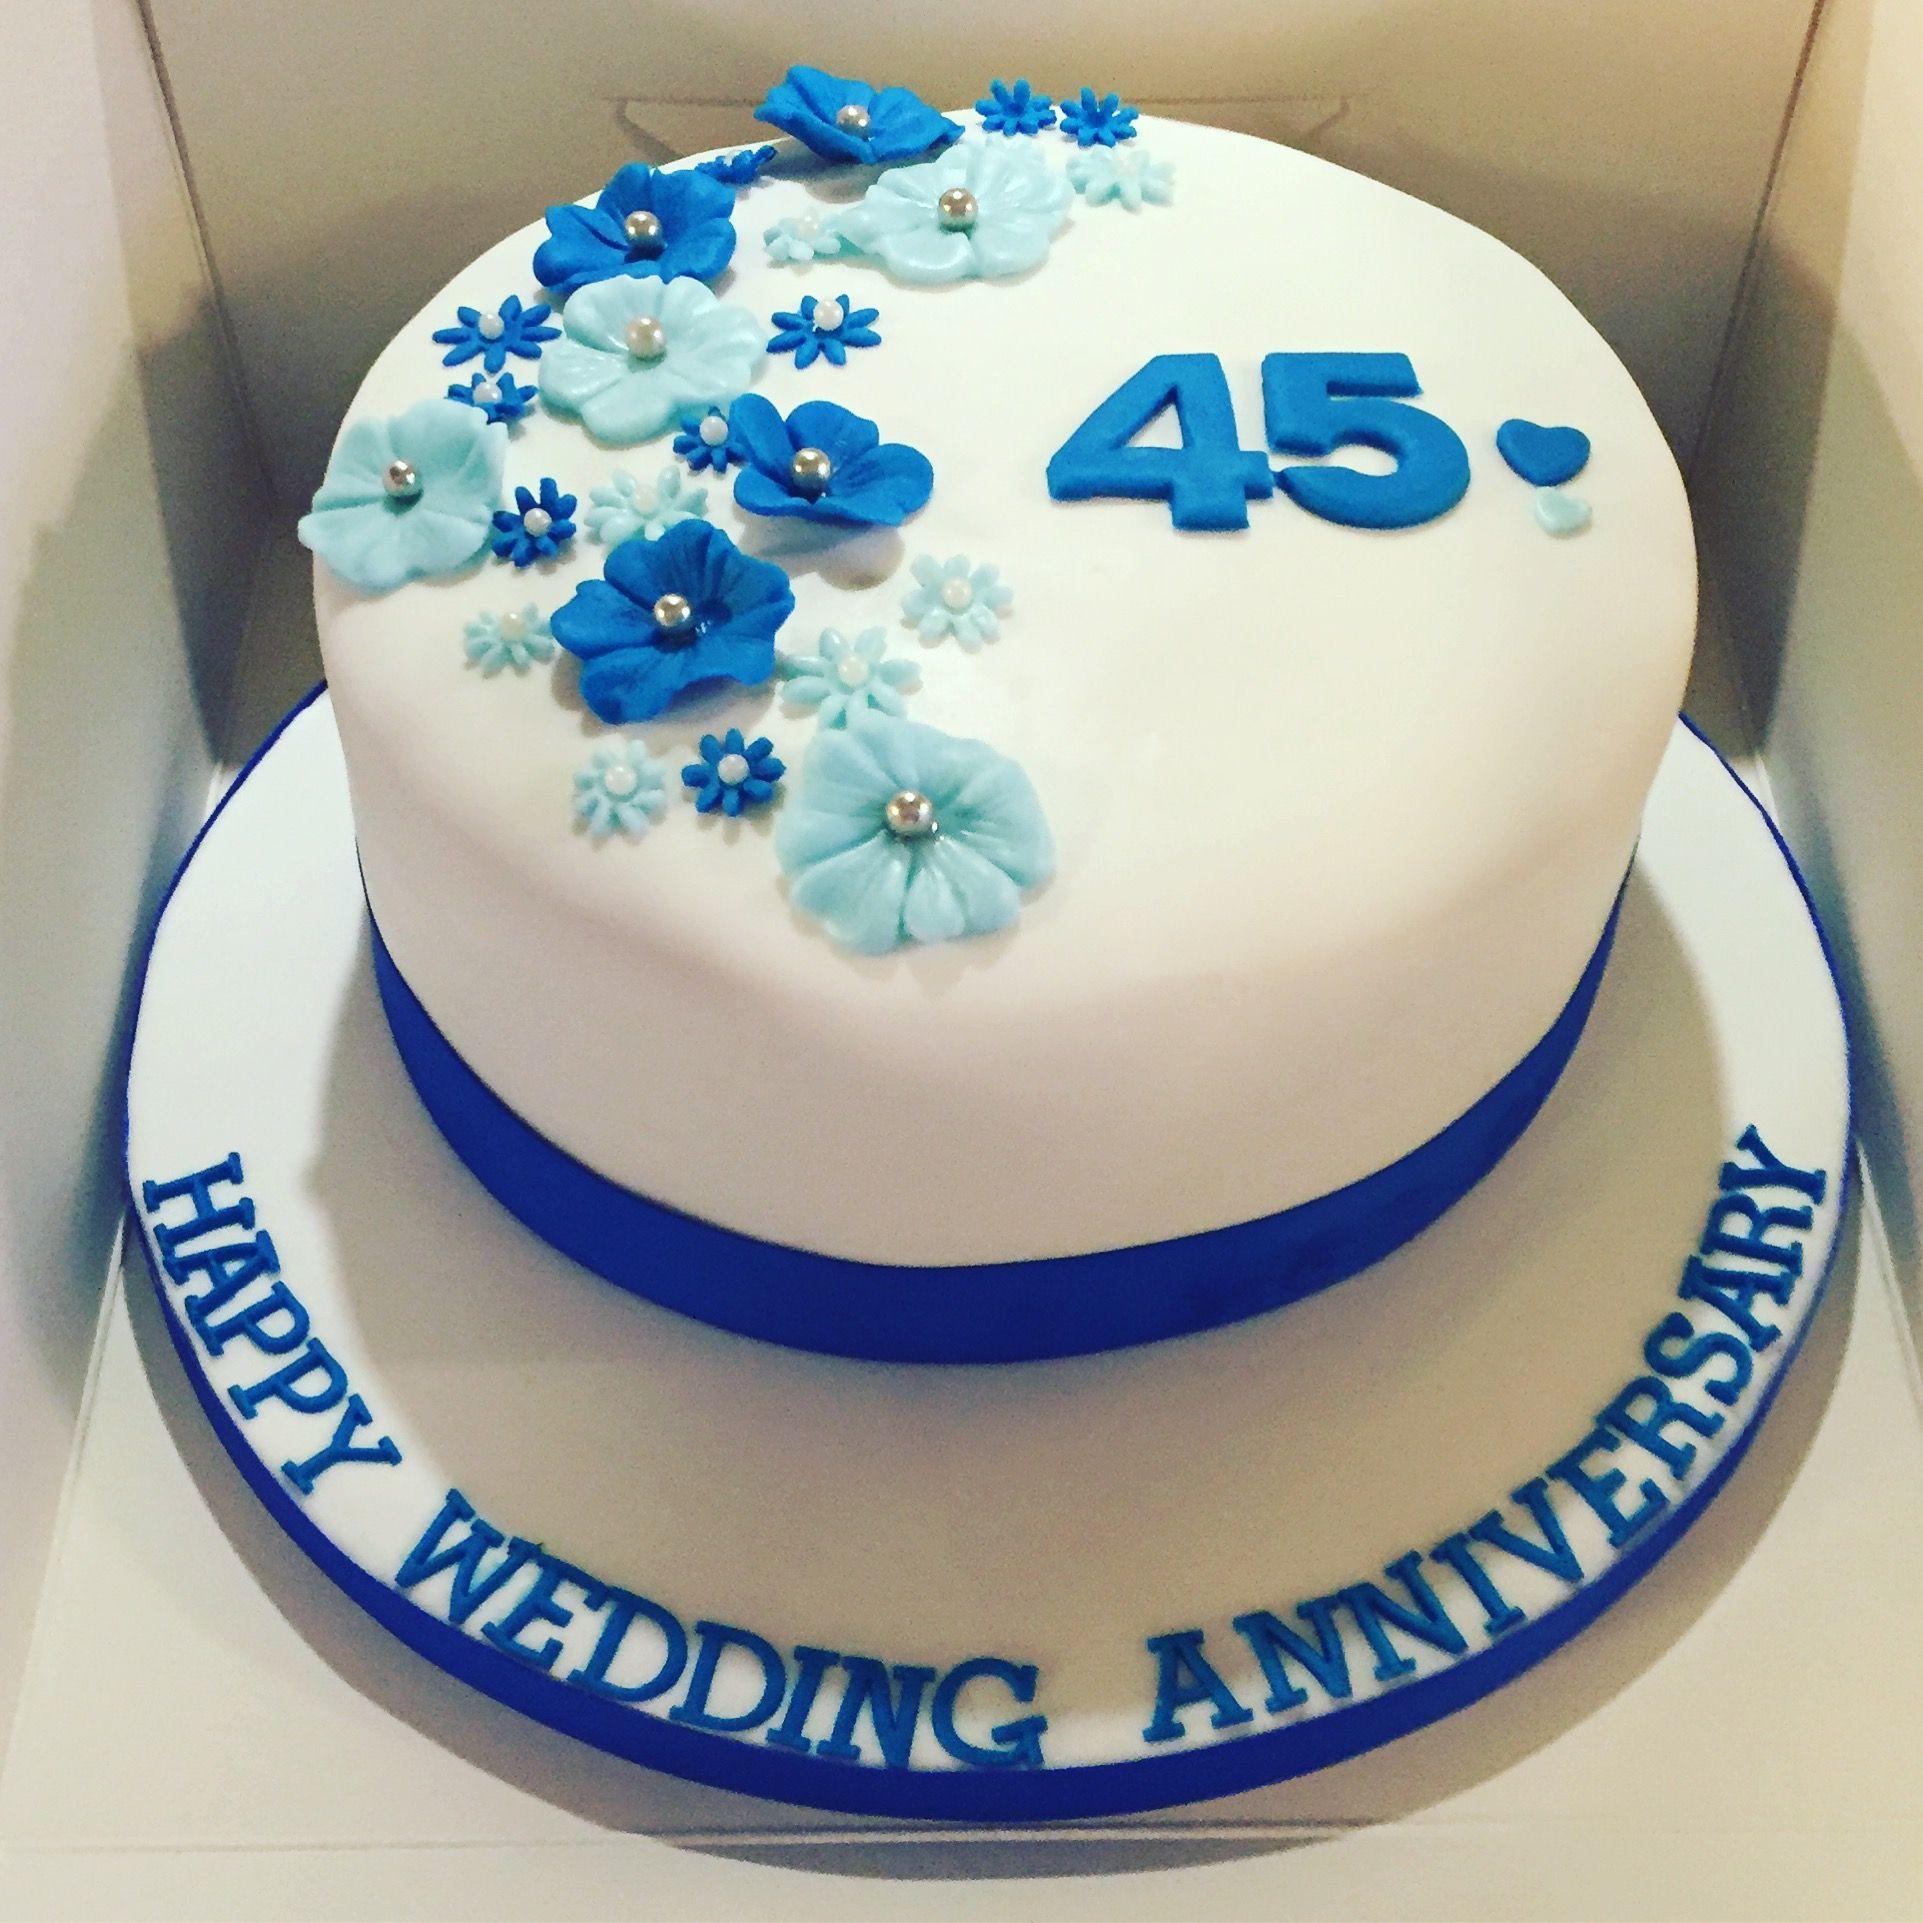 45 Wedding Anniversary Gift Ideas: 45th Wedding Anniversary Cake #blueflowers